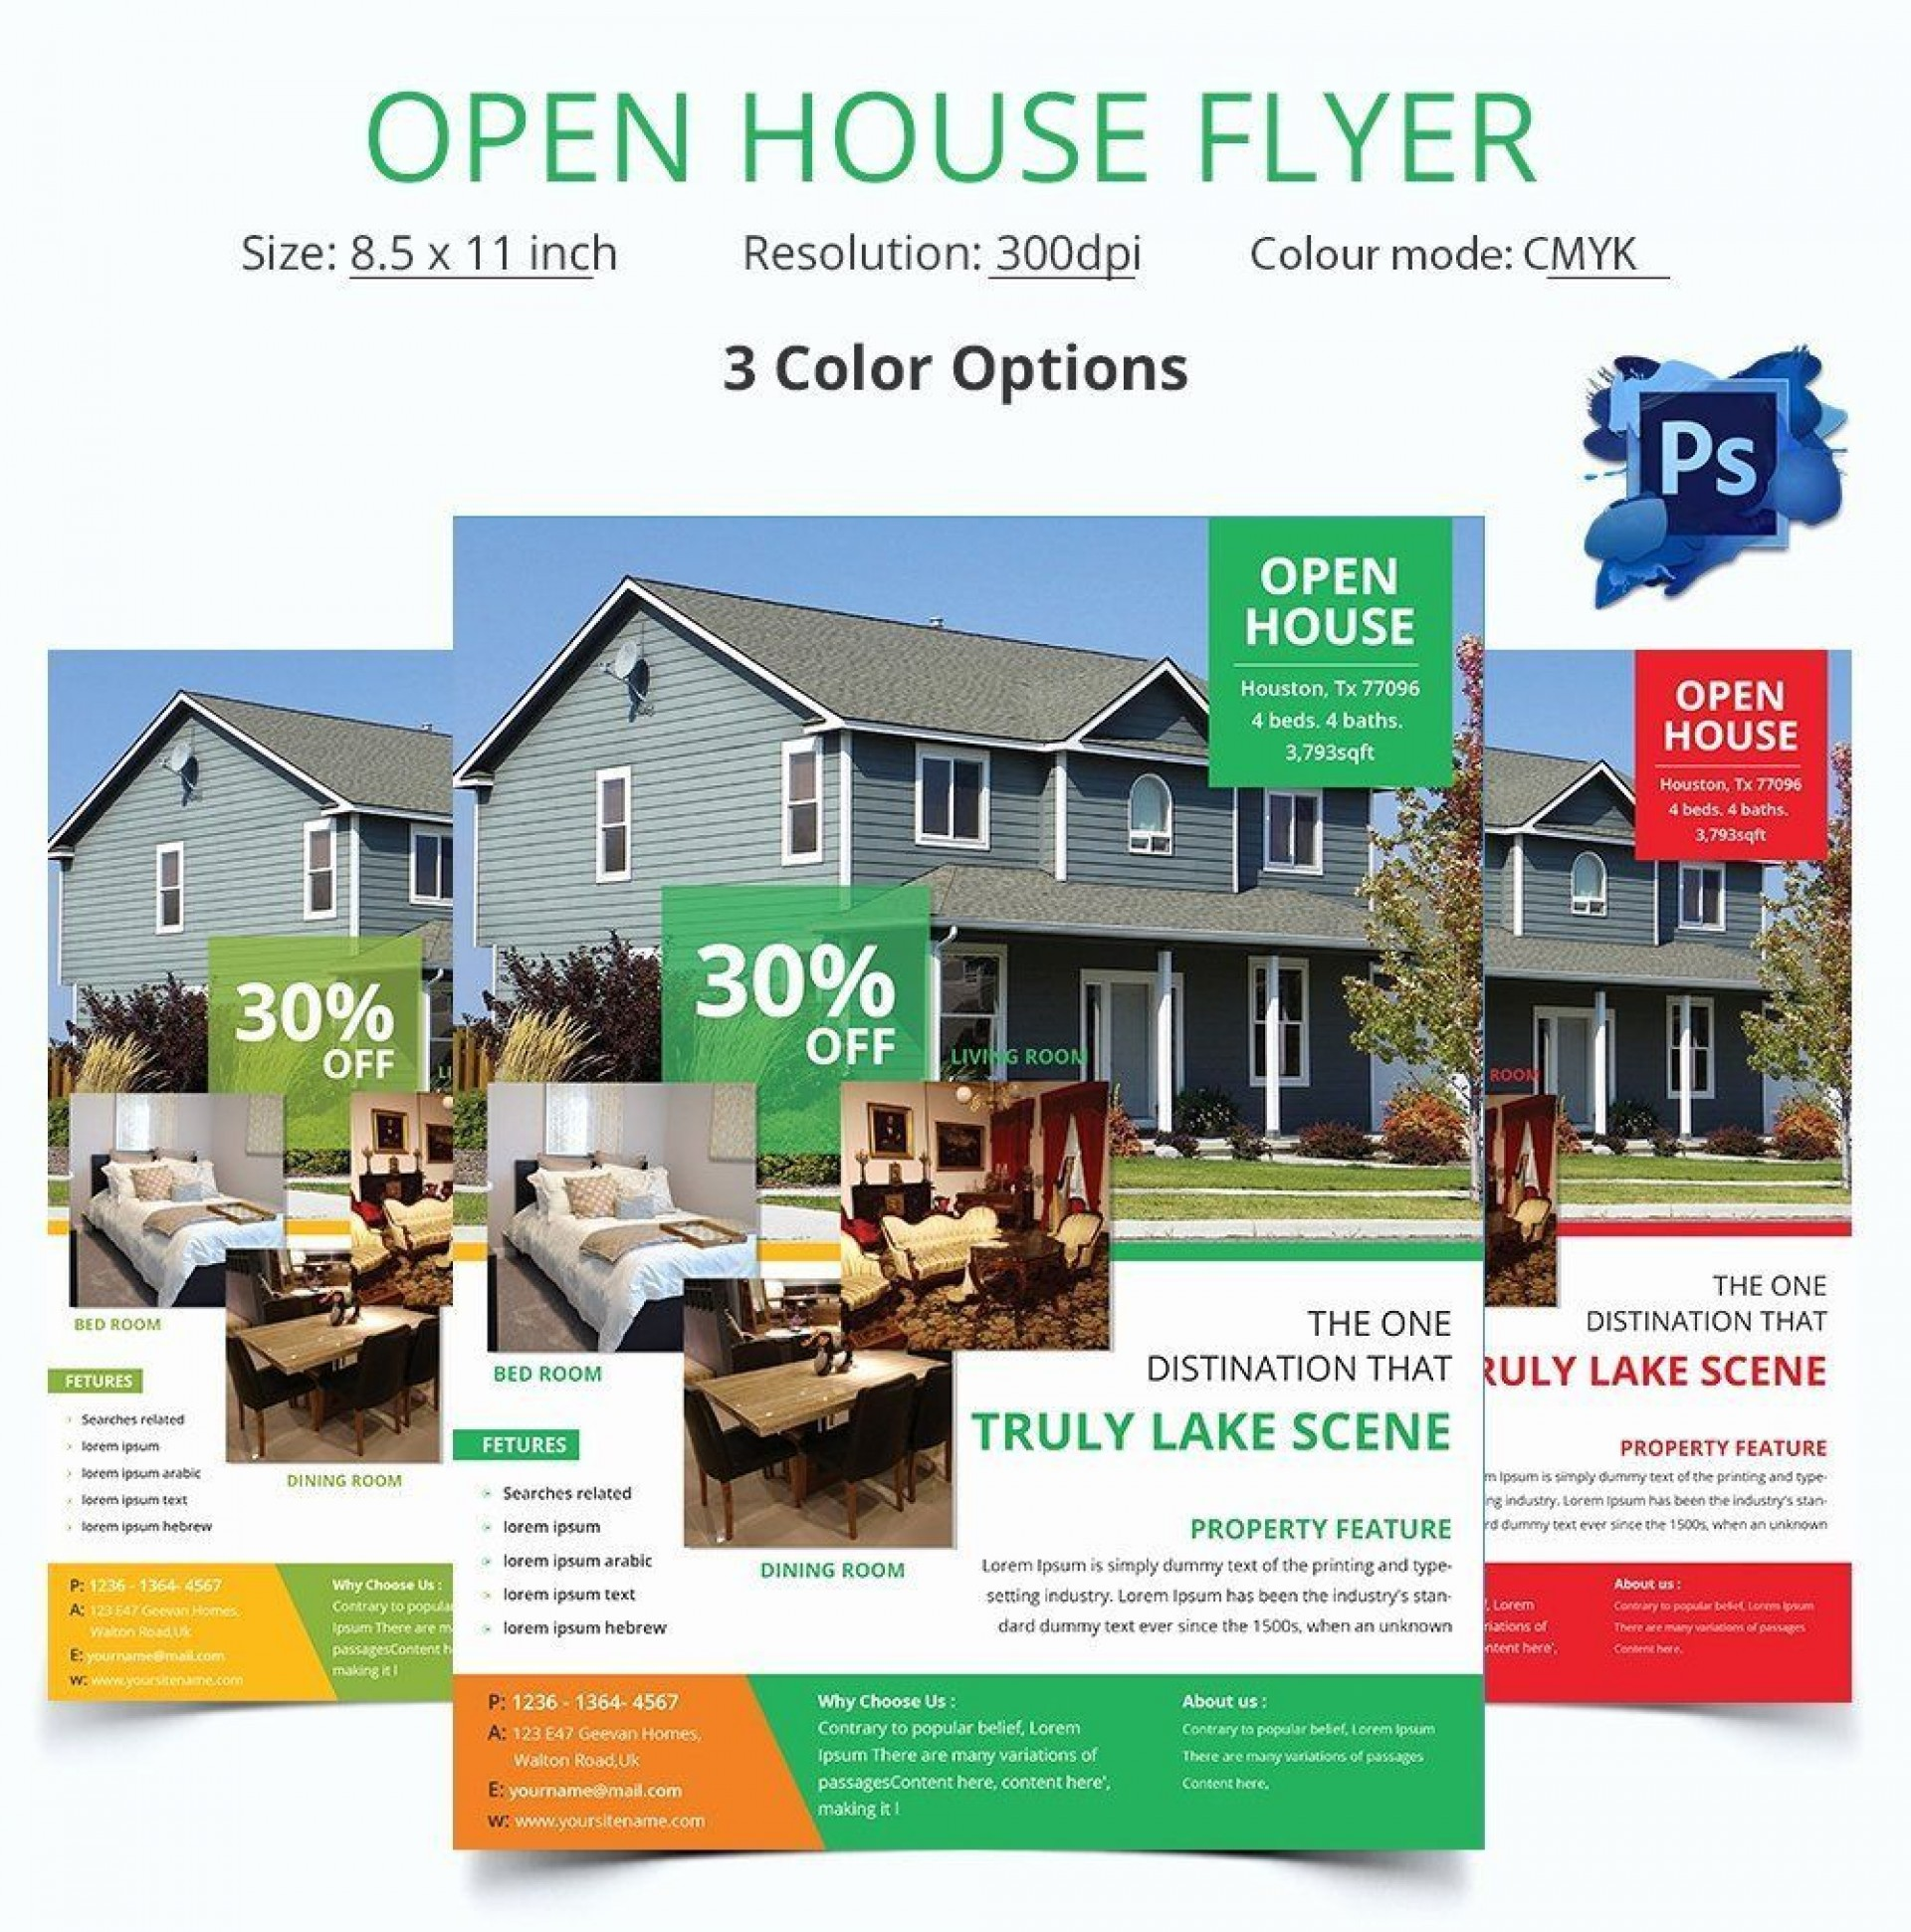 005 Stupendou Open House Flyer Template Free High Definition  Holiday Preschool School Microsoft1920